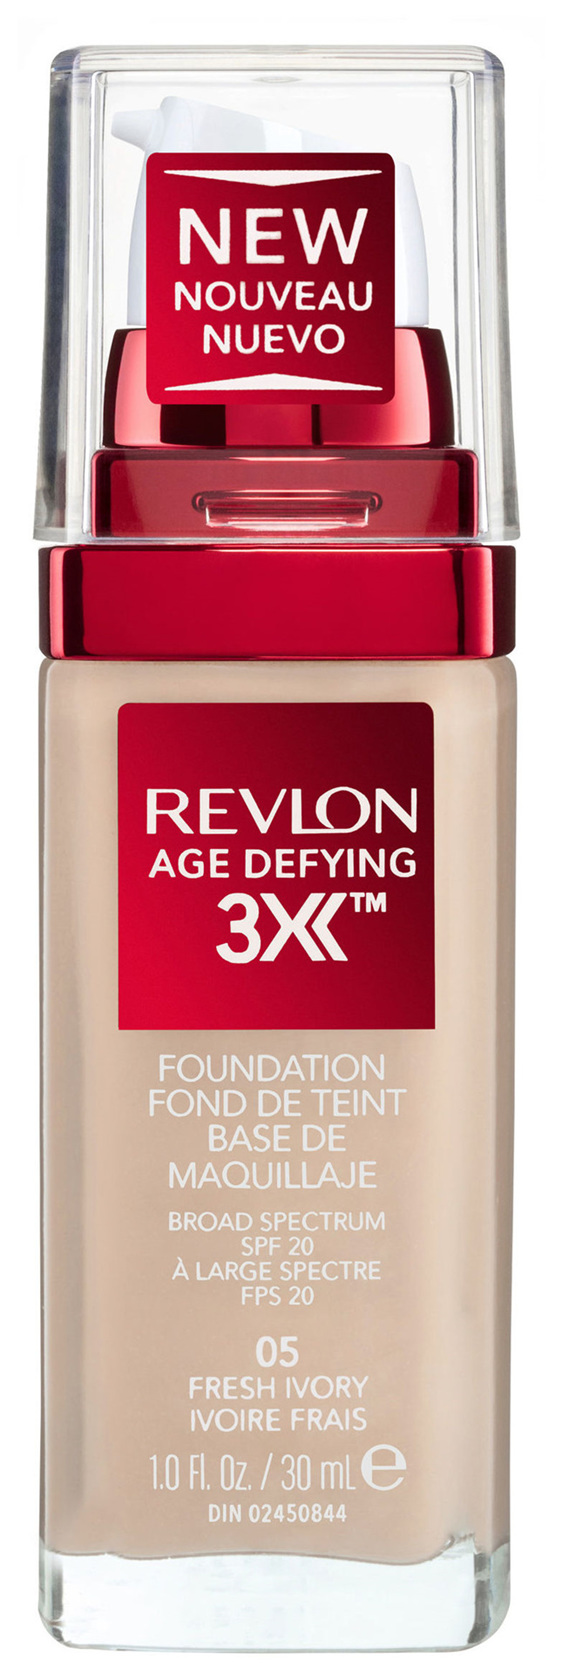 Revlon Age Defying™ 3X Foundation 05 Fresh Ivory